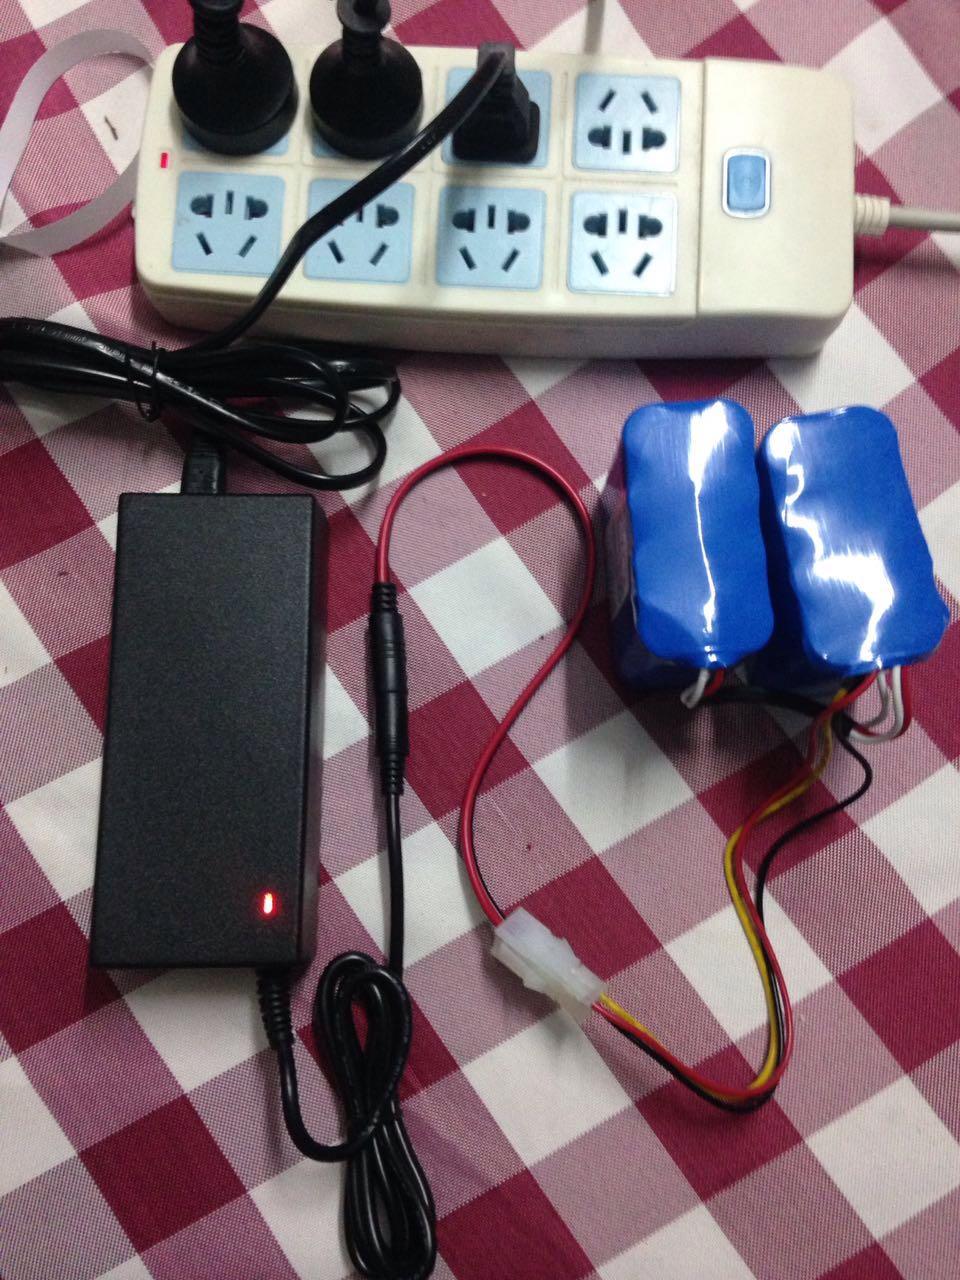 Yujin Robot Kobuki Turtlebot2 battery Customized special charger for 2200mah 4400mah 10400mah Turtlebot2 battery